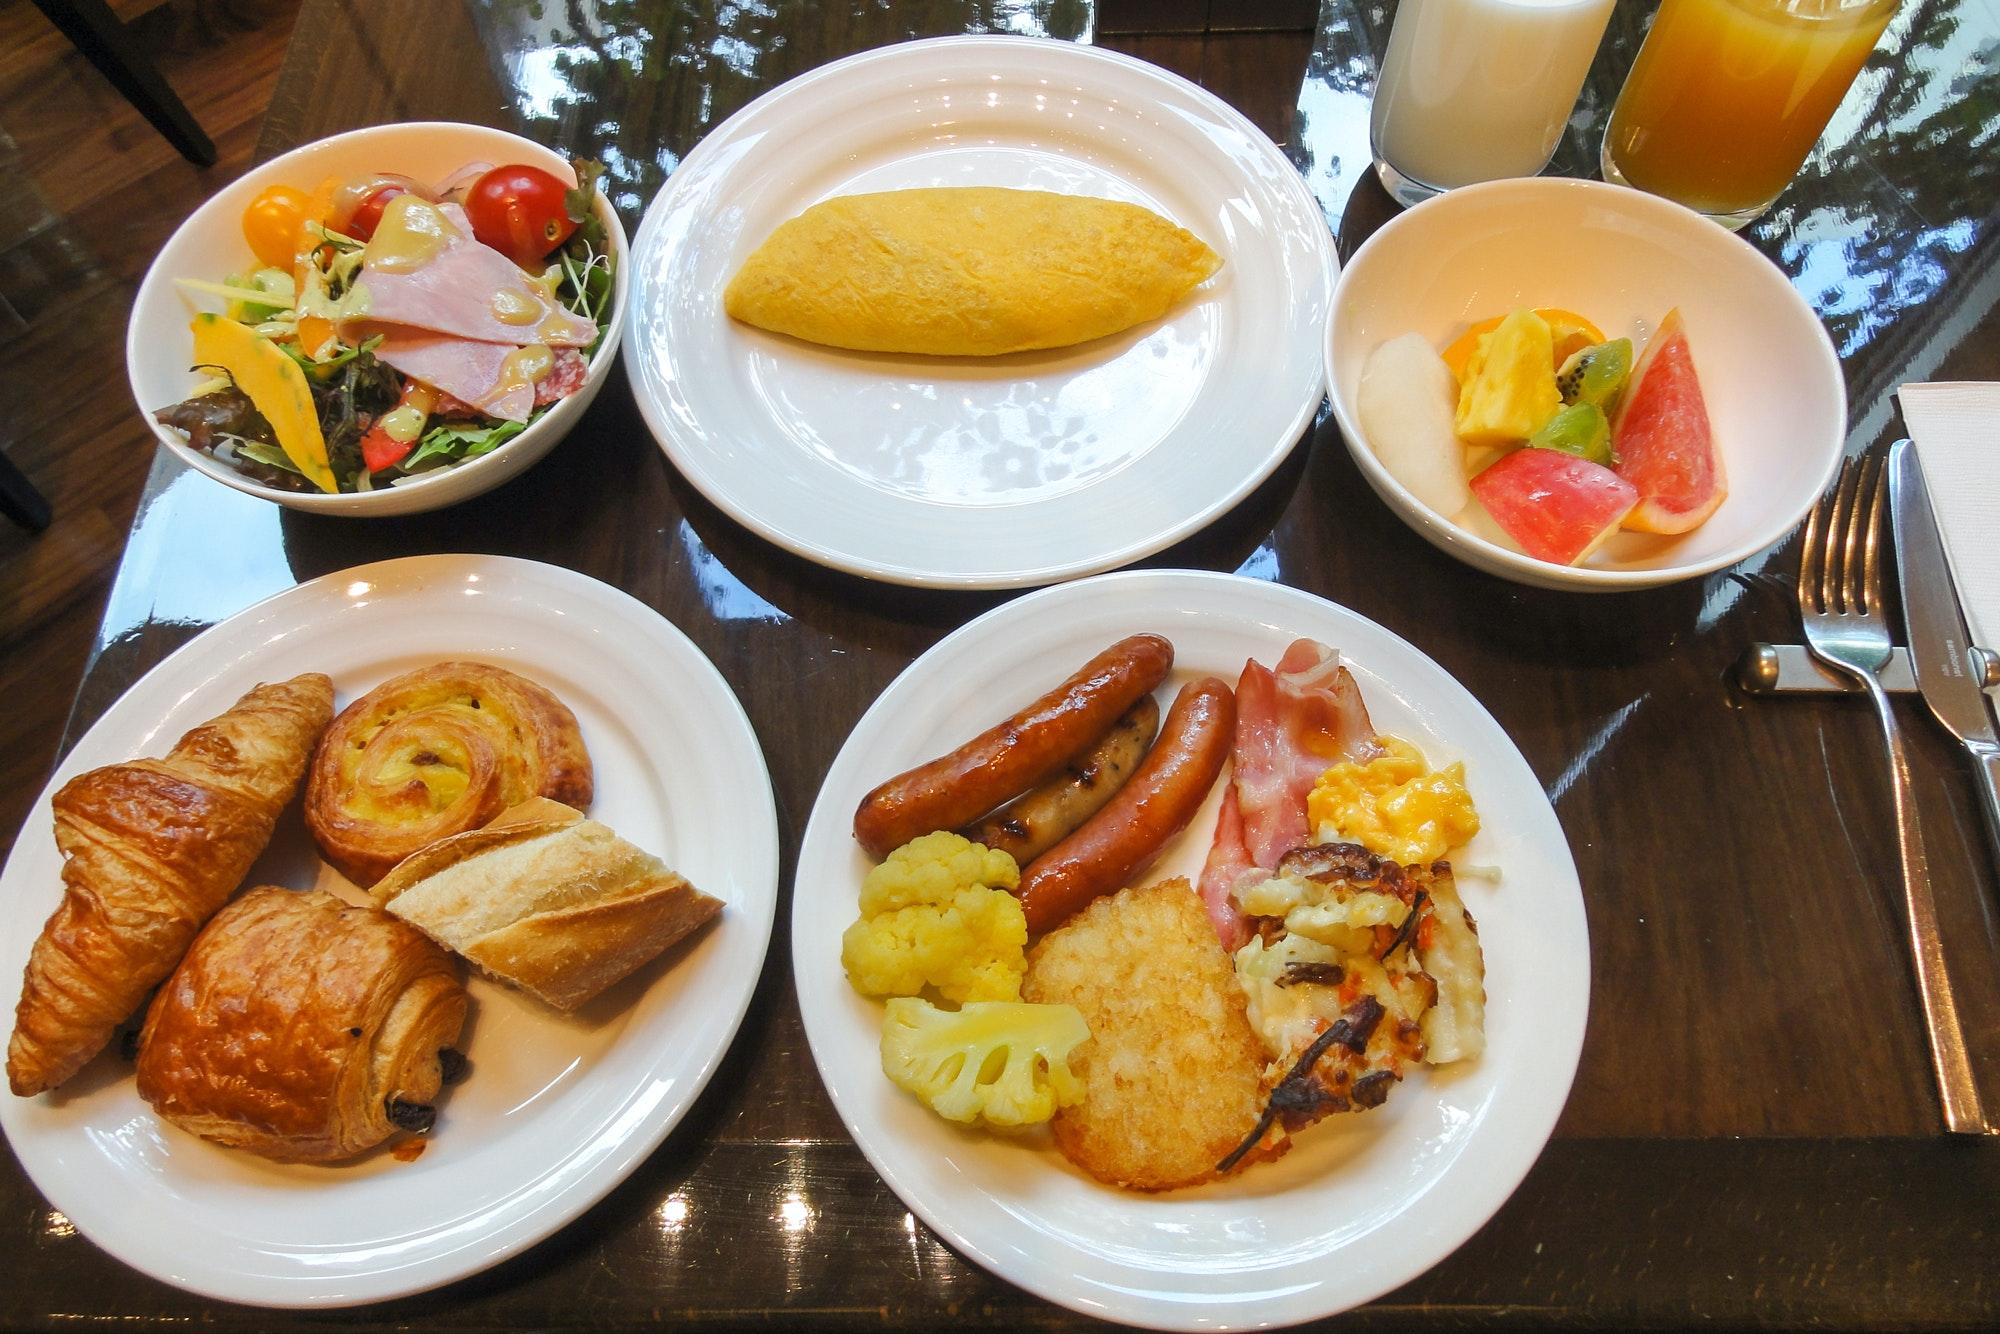 Hotel Niwa Tokyo Breakfast Buffet 20131028 001